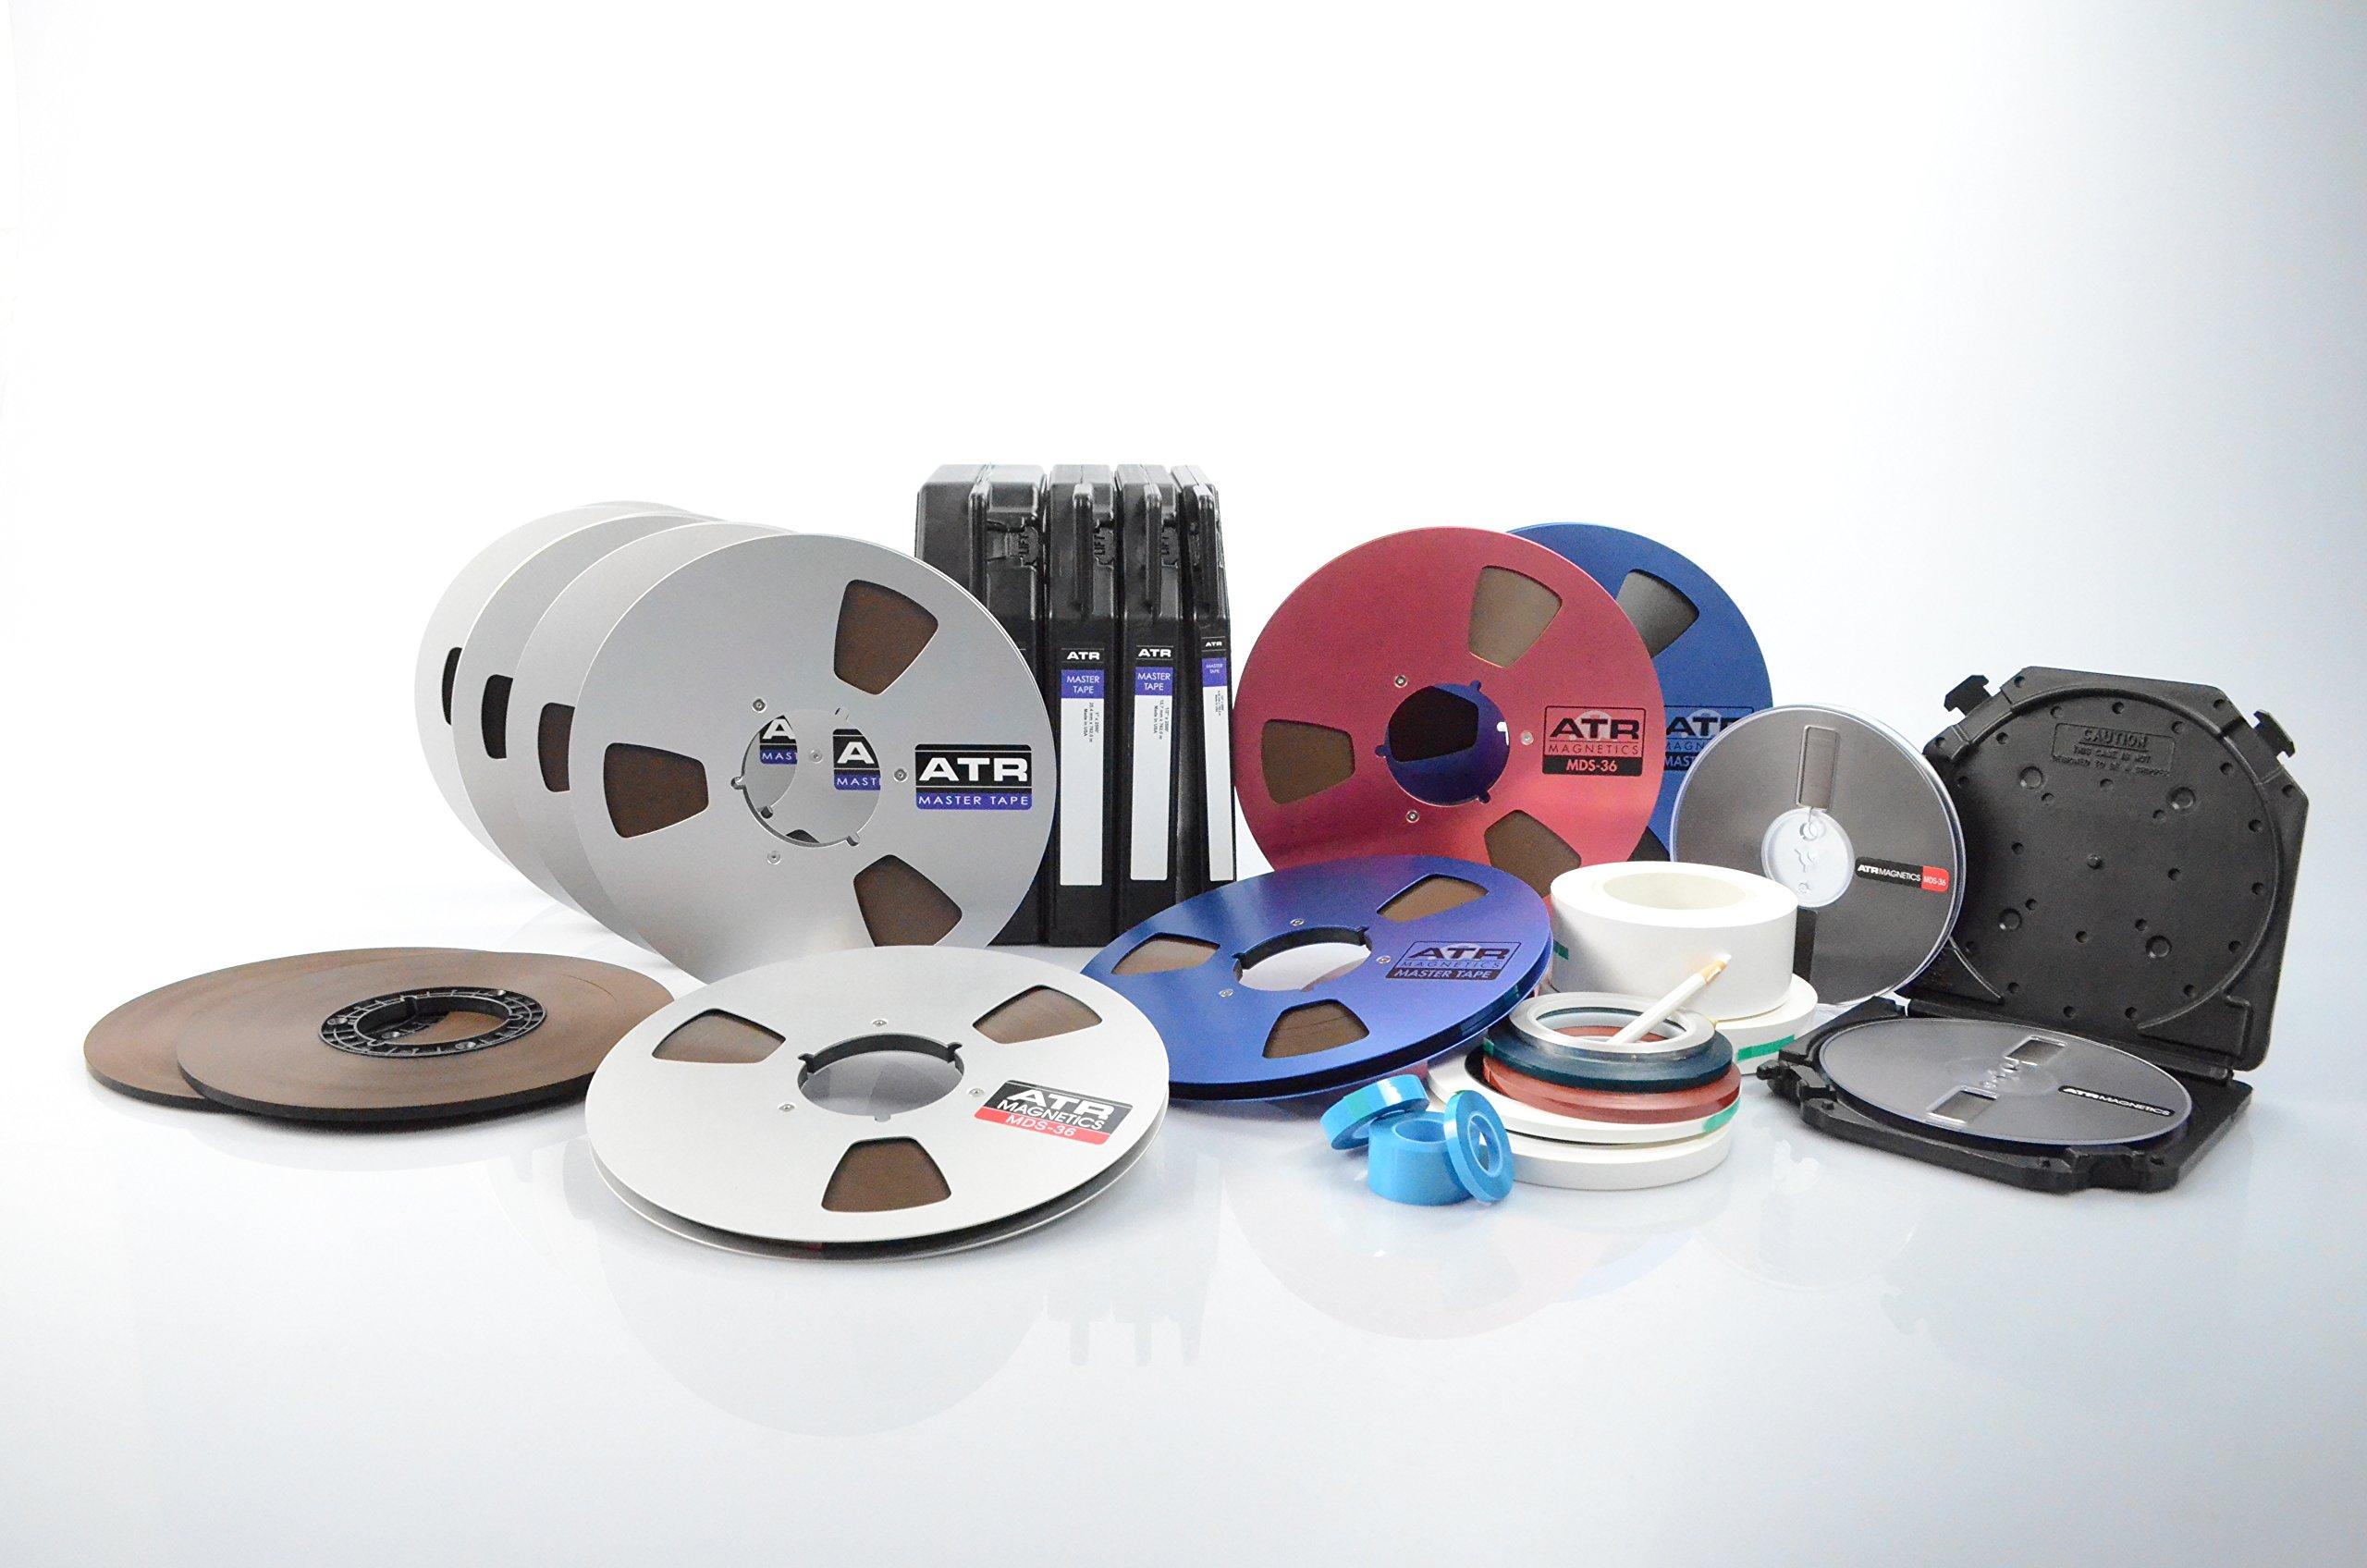 "Premium Analog Recording Tape by ATR Magnetics   1/4"" Master Tape - Modern Classic Sound   NAB Hub   2500' of Analog Tape"